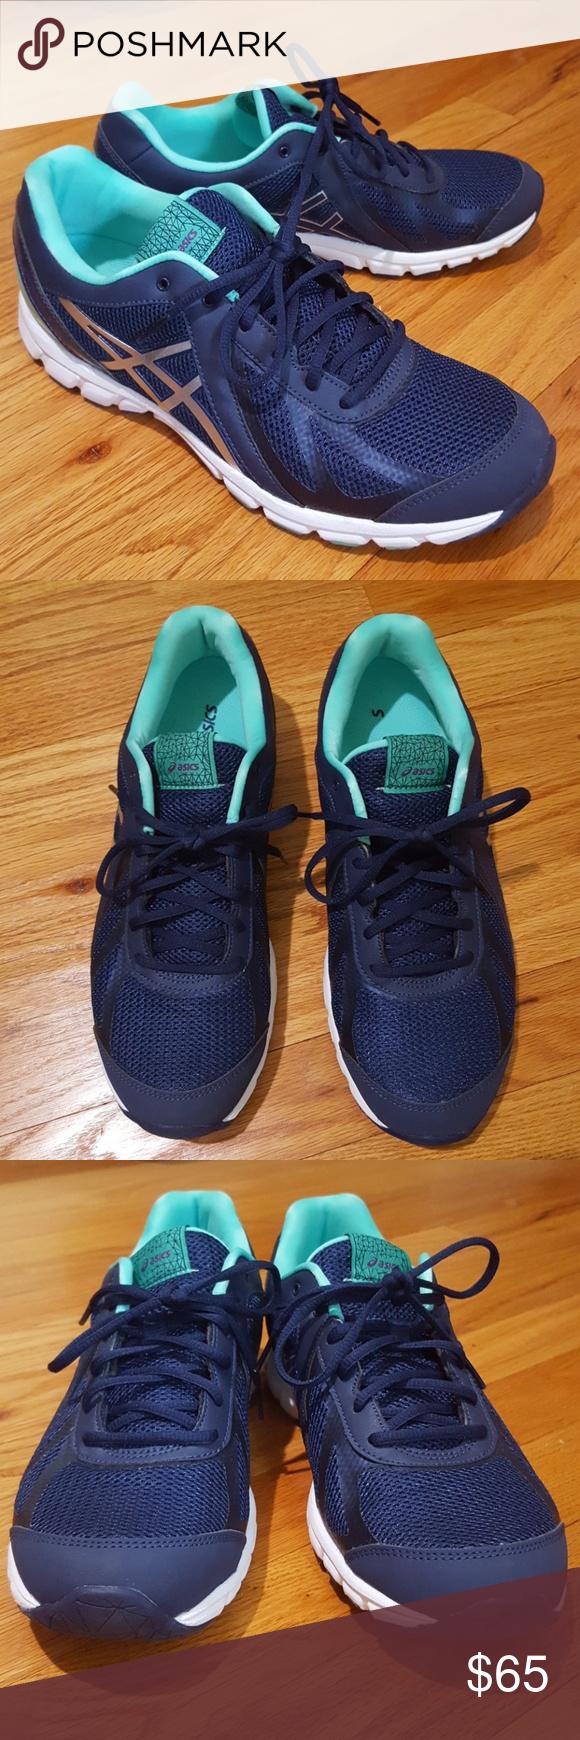 Asics Walking Shoe Gel Frequency 3 Navy & Mint 9.5 Shoes